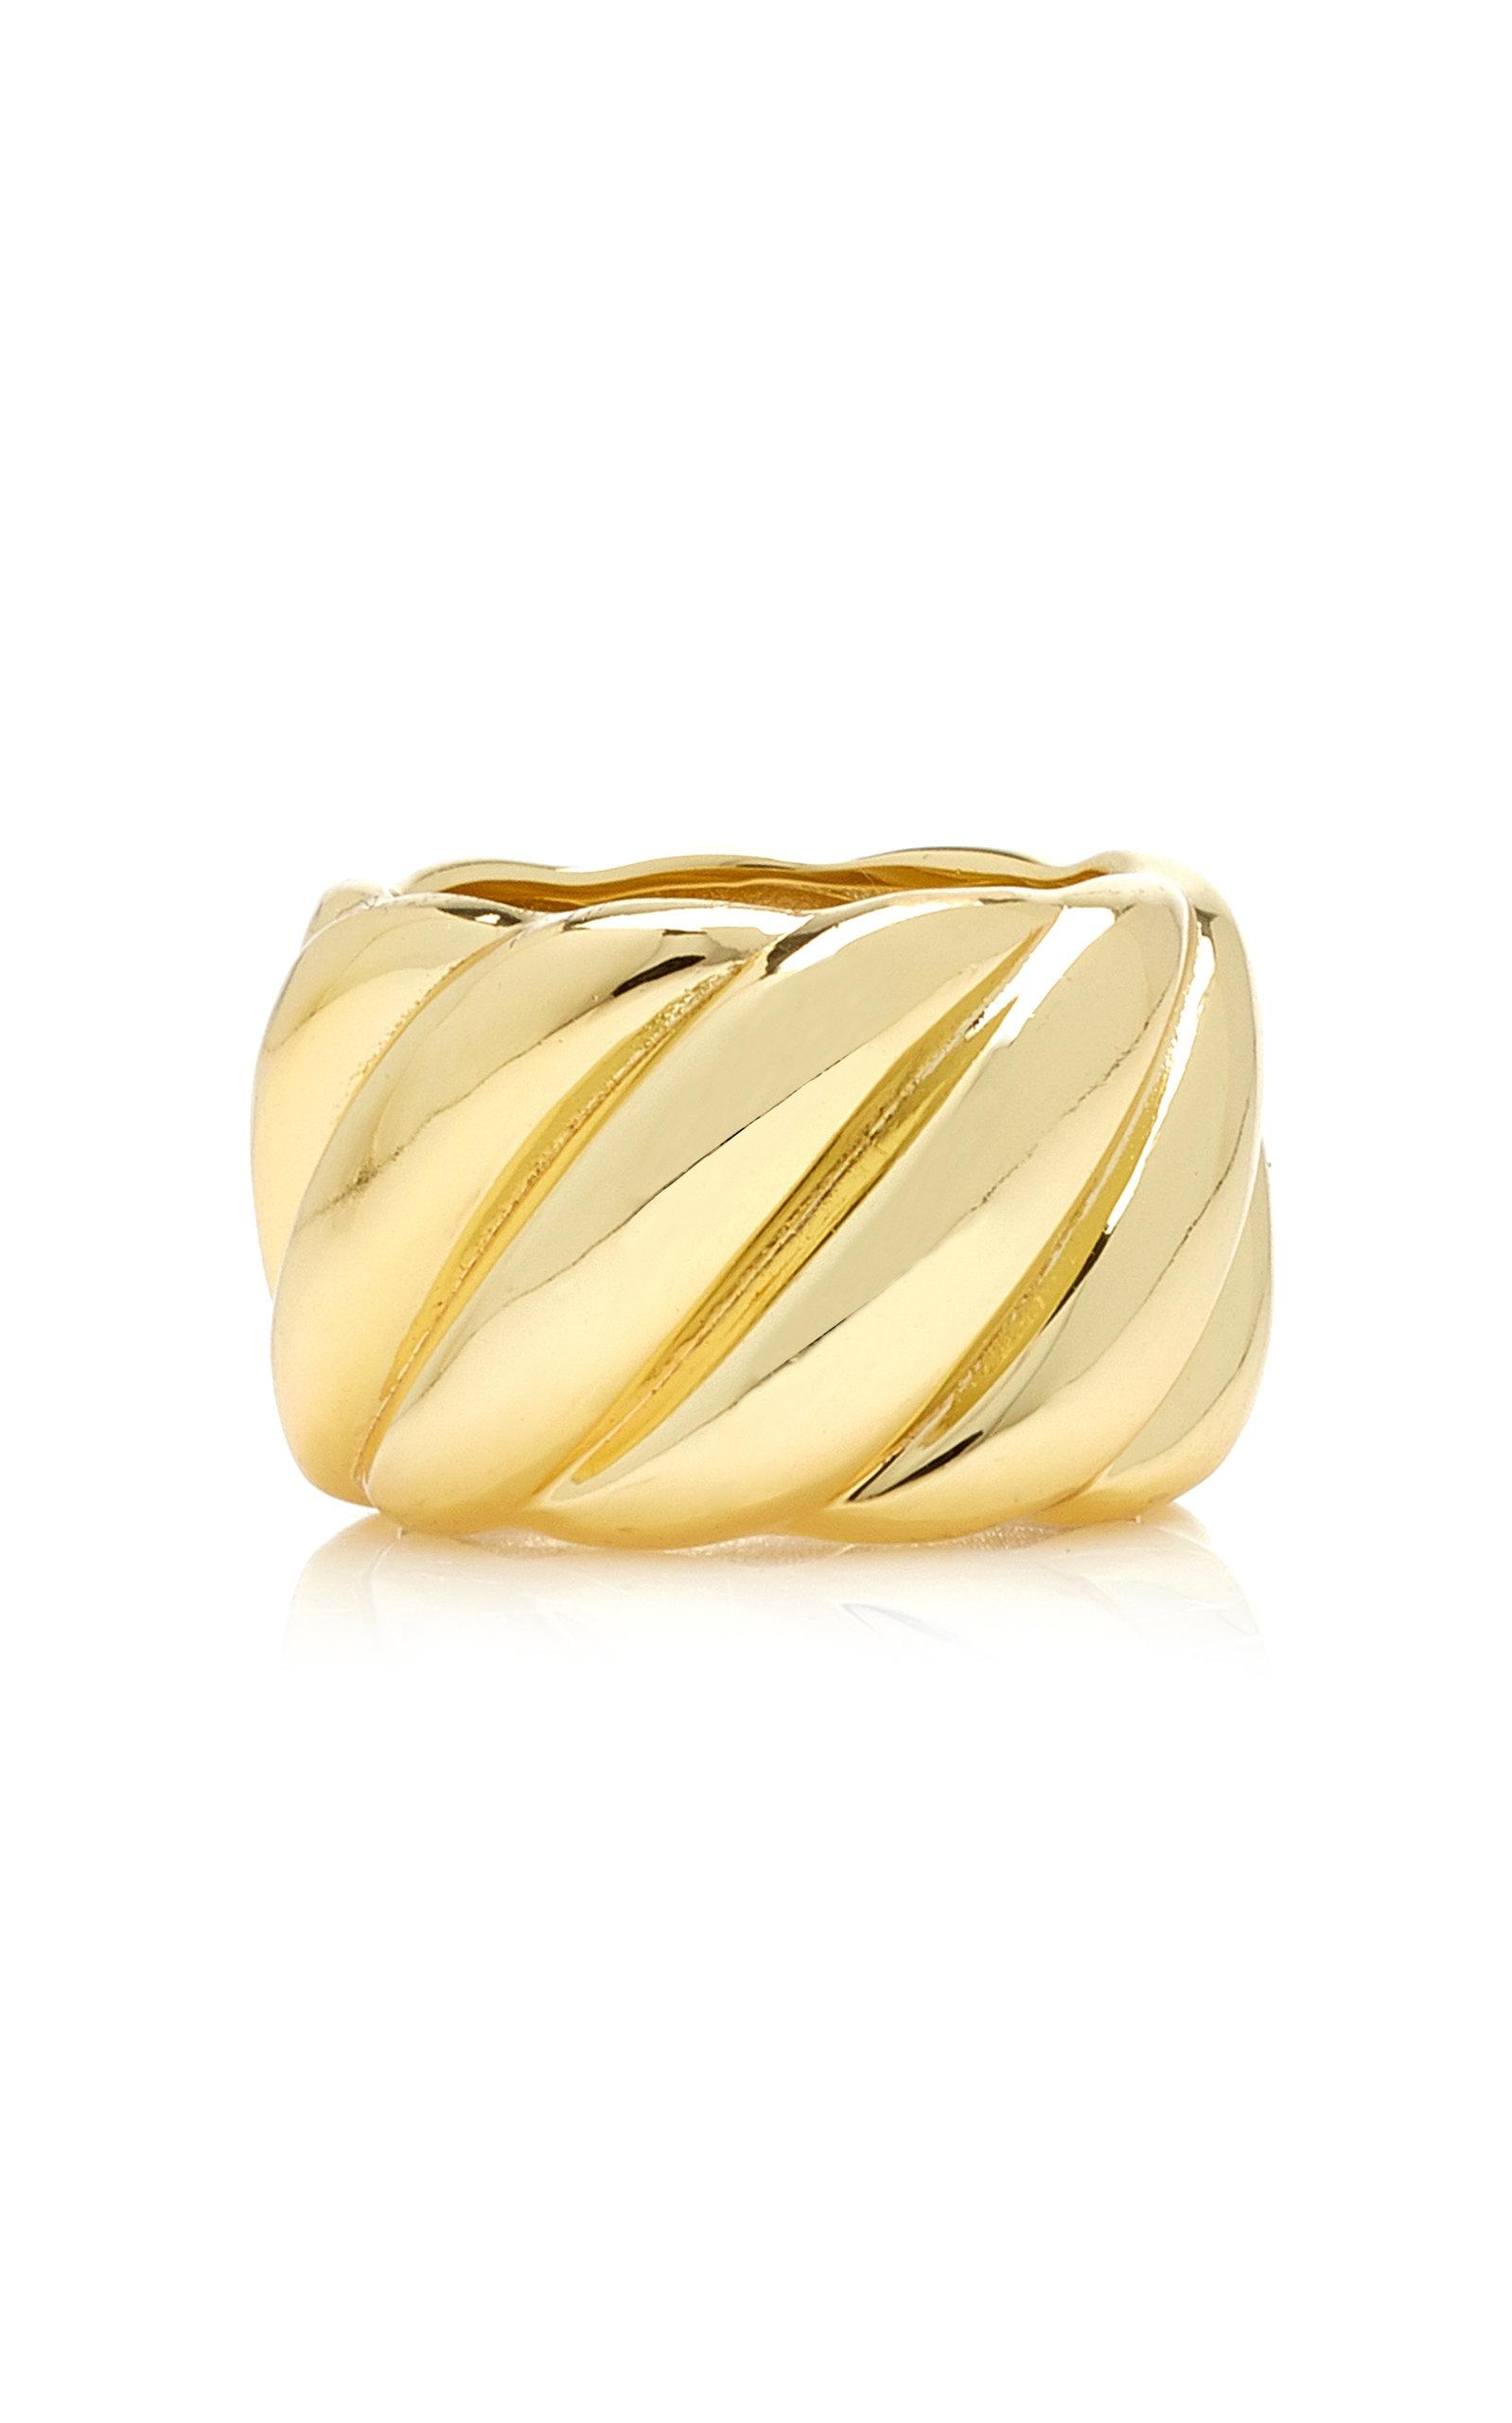 Emili - Women's Diane 14K Gold-Plated Ring - Gold - Moda Operandi